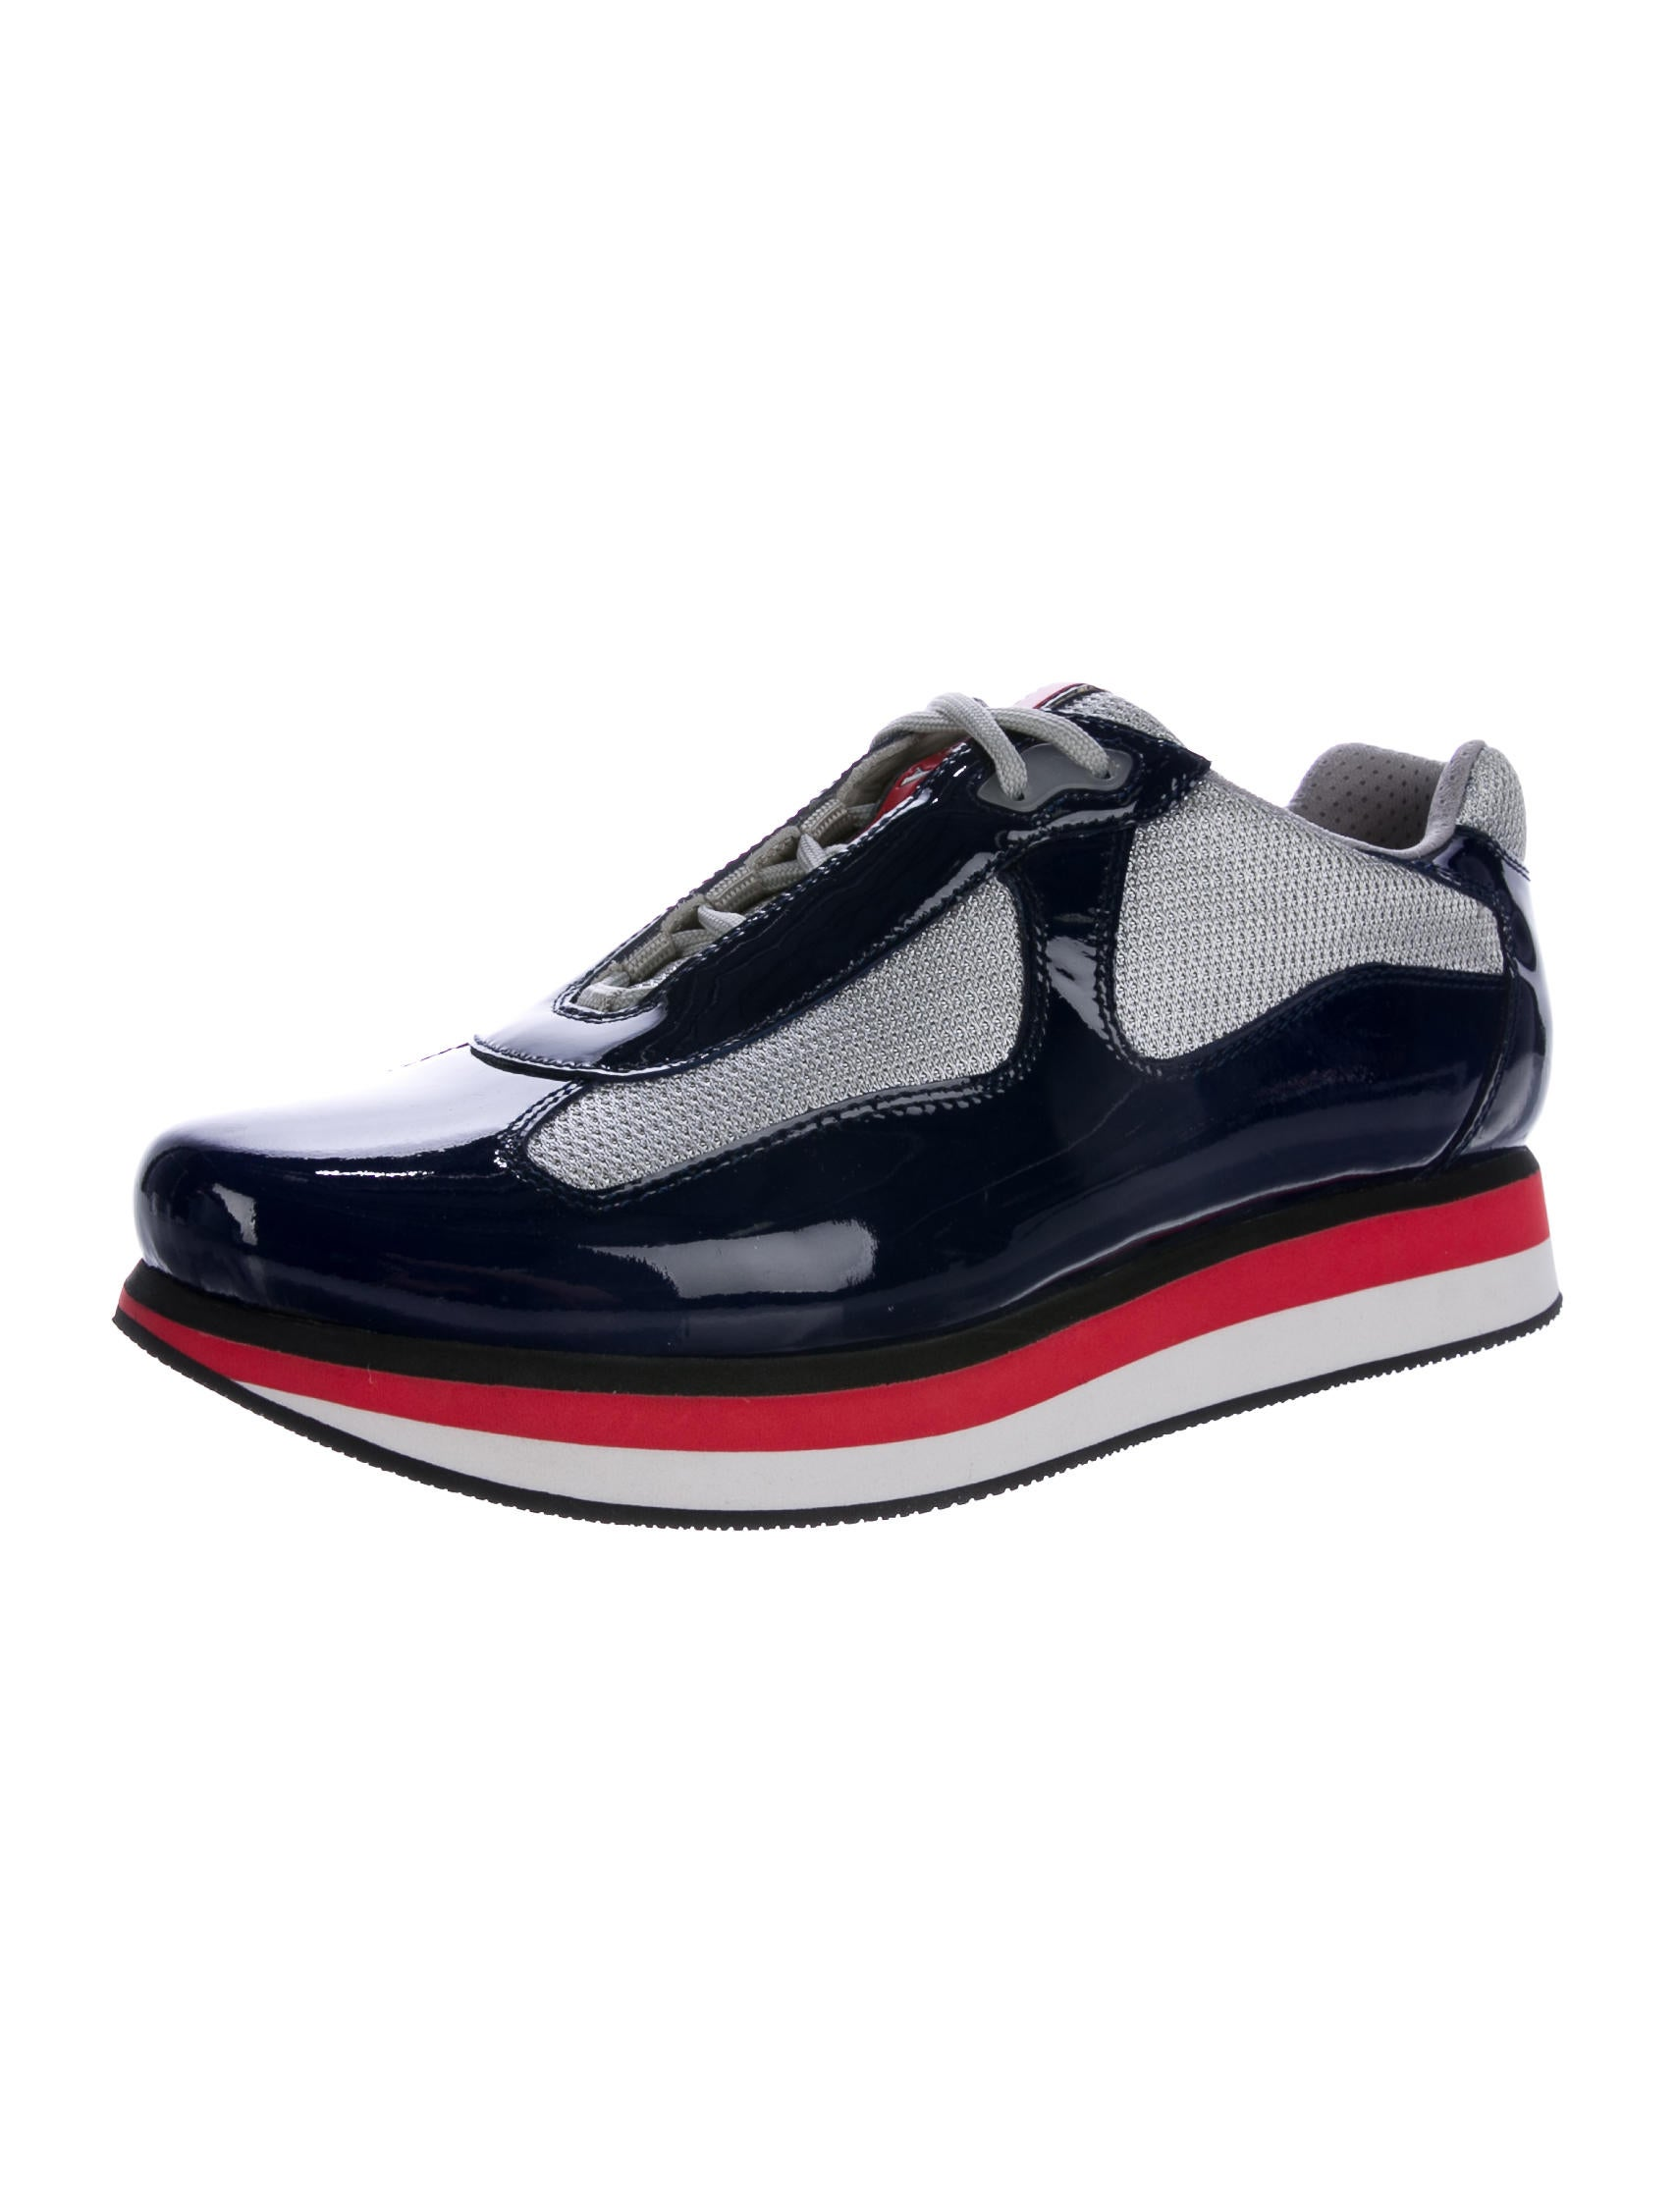 prada sport vernice bike sneaker shoes wpr43009 the